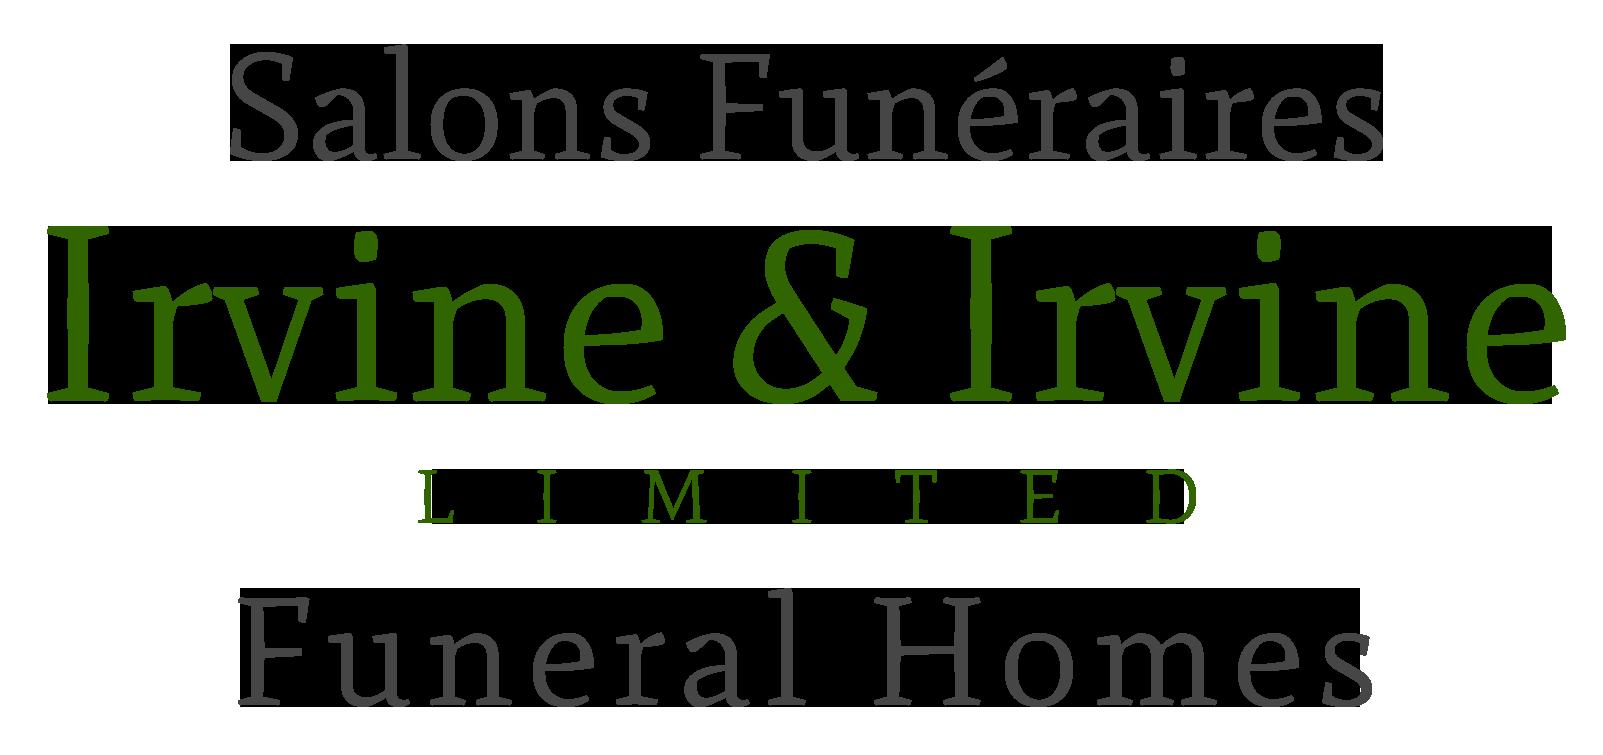 Salon funéraire Irvine & Irvine